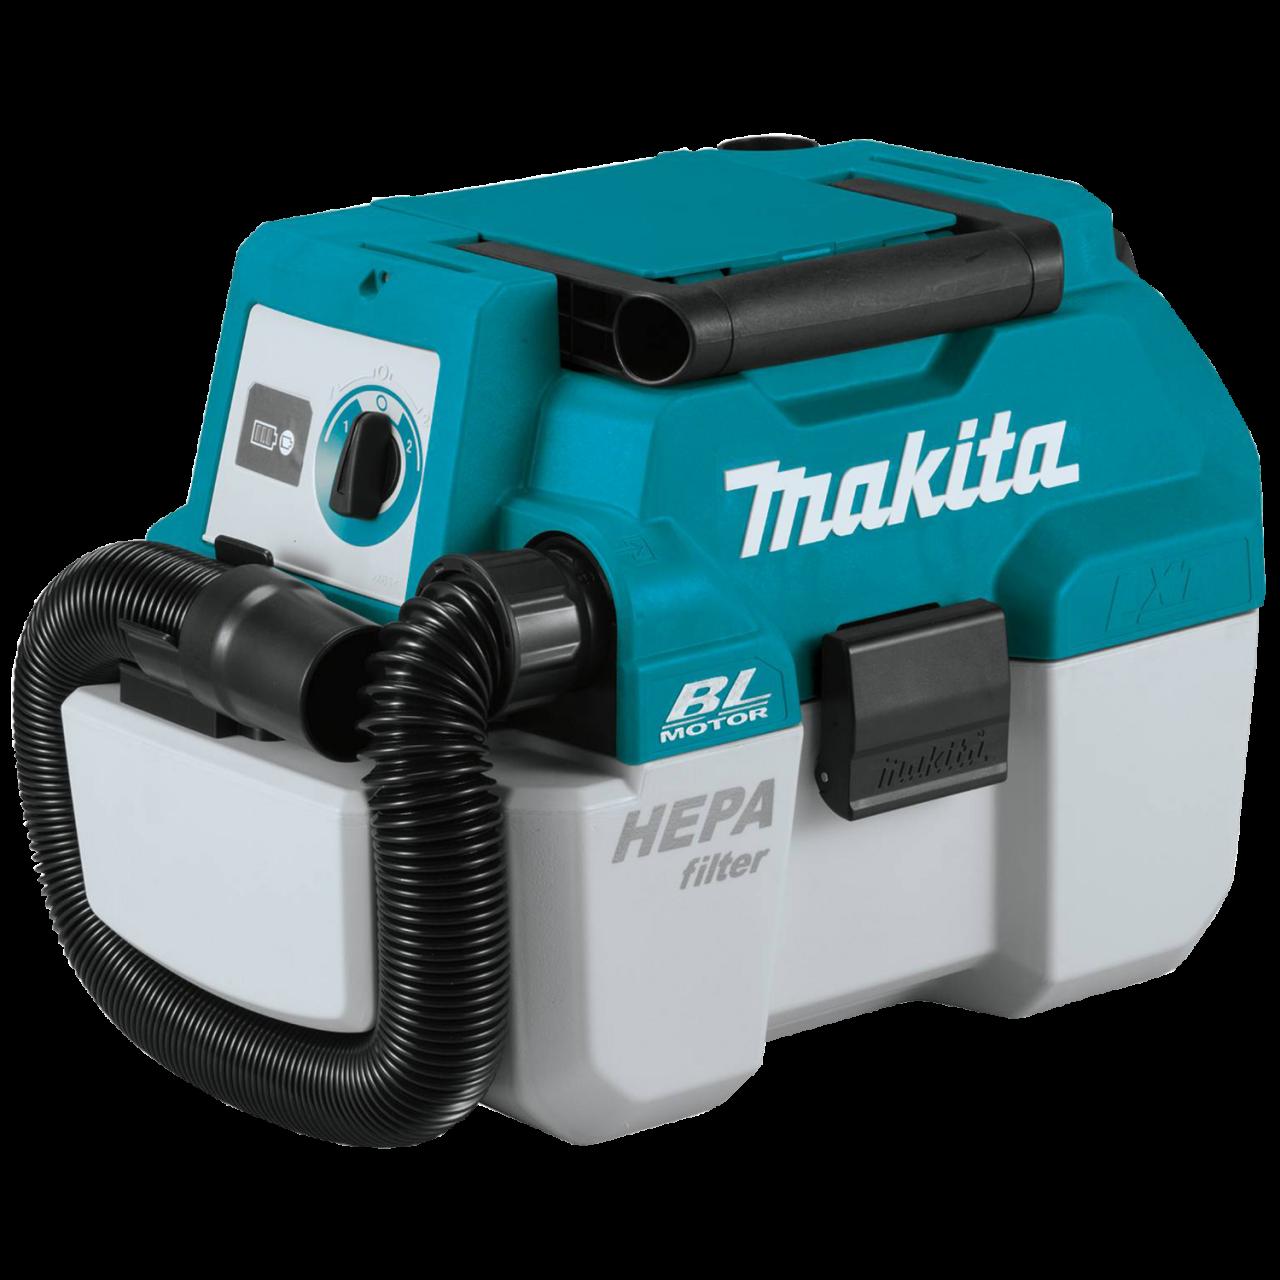 Makita DVC750LZX1 Akku-Staubsauger 7,5 l inkl. Zubehör